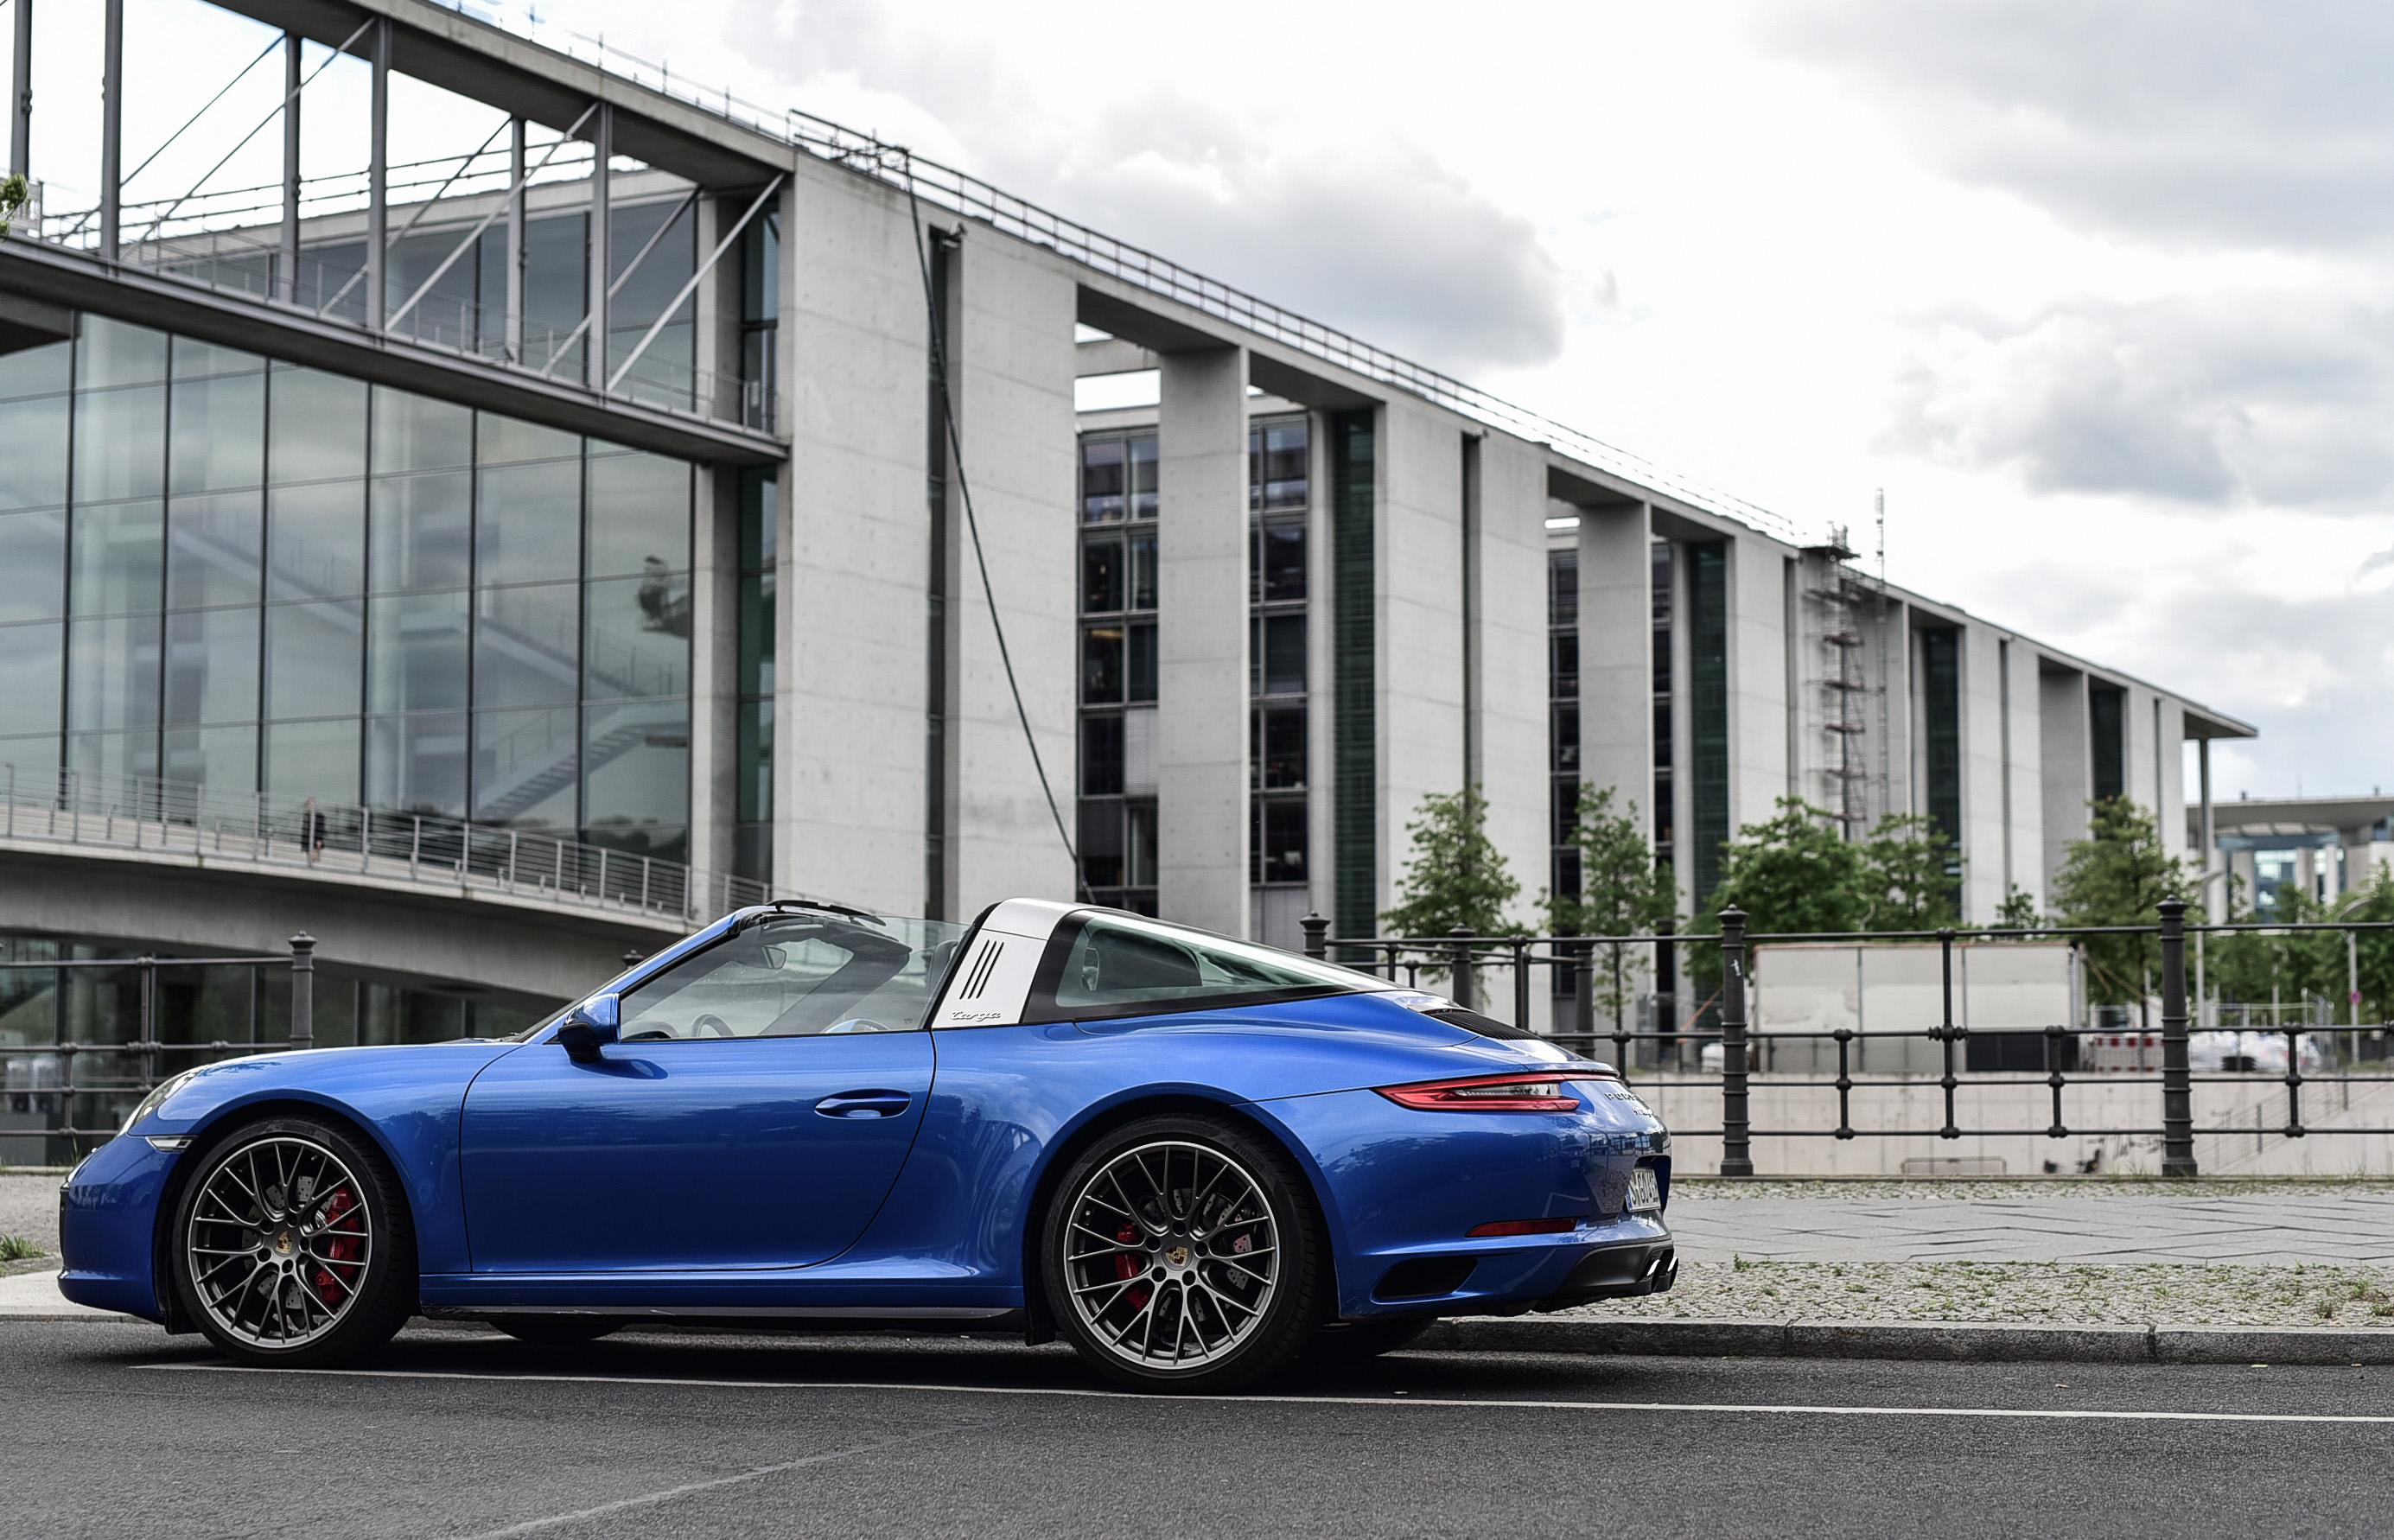 Tommeezjerry-Maennermodeblog-Maennermode-Fashionblog-Styleblog-Berlinblog--Lifestyleblog-Lausitzring-Certina-Watches-Timekeeper-Porsche-Design-Targa-911-Casual-Look-Armani